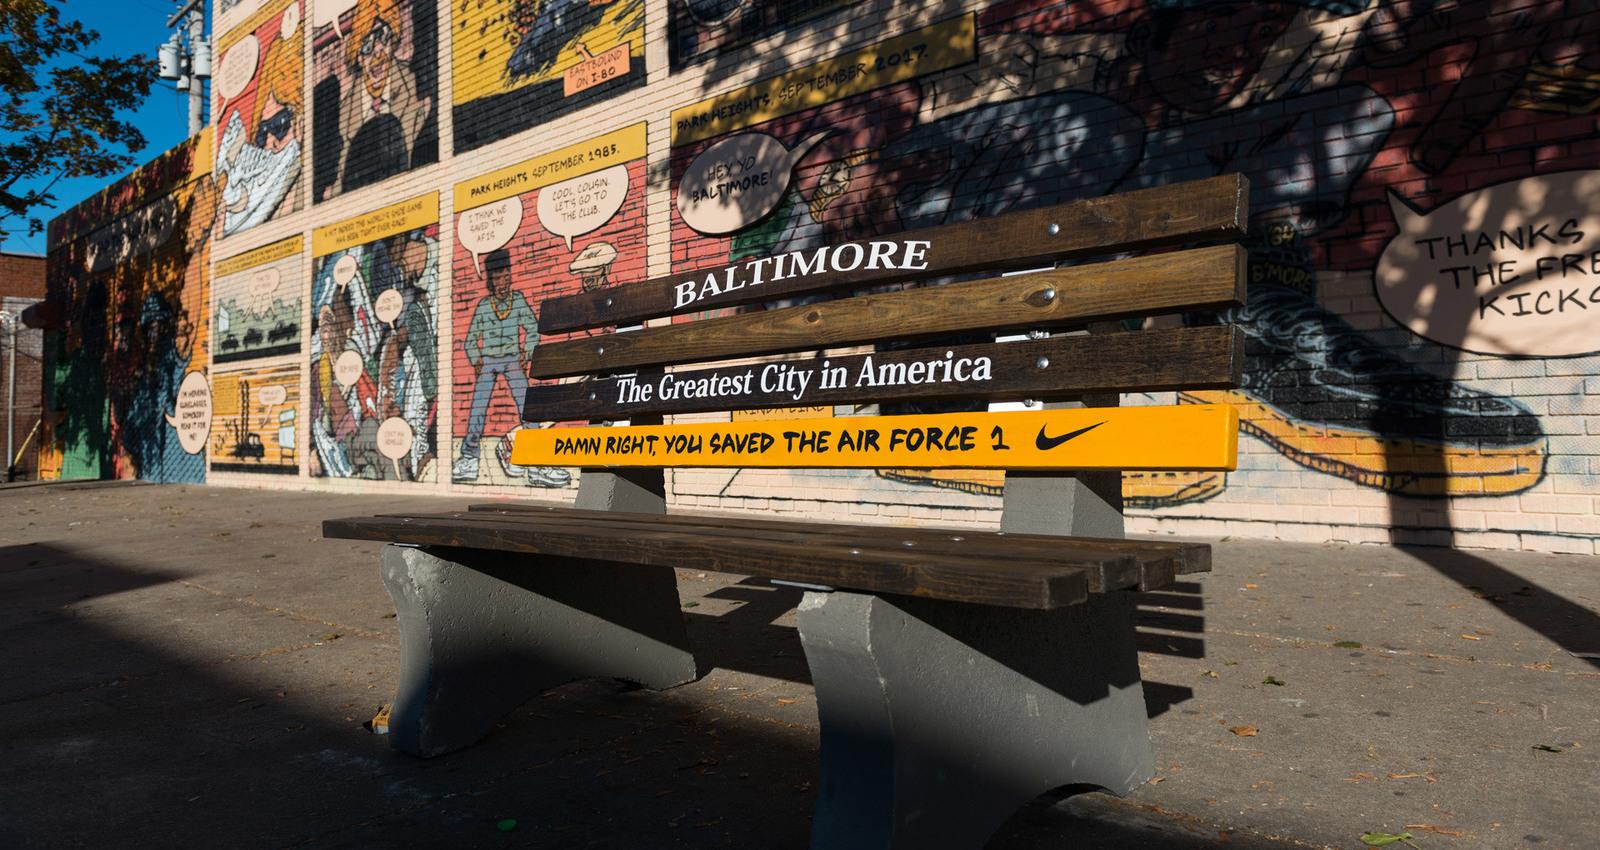 Nike Air Force 1 Baltimore